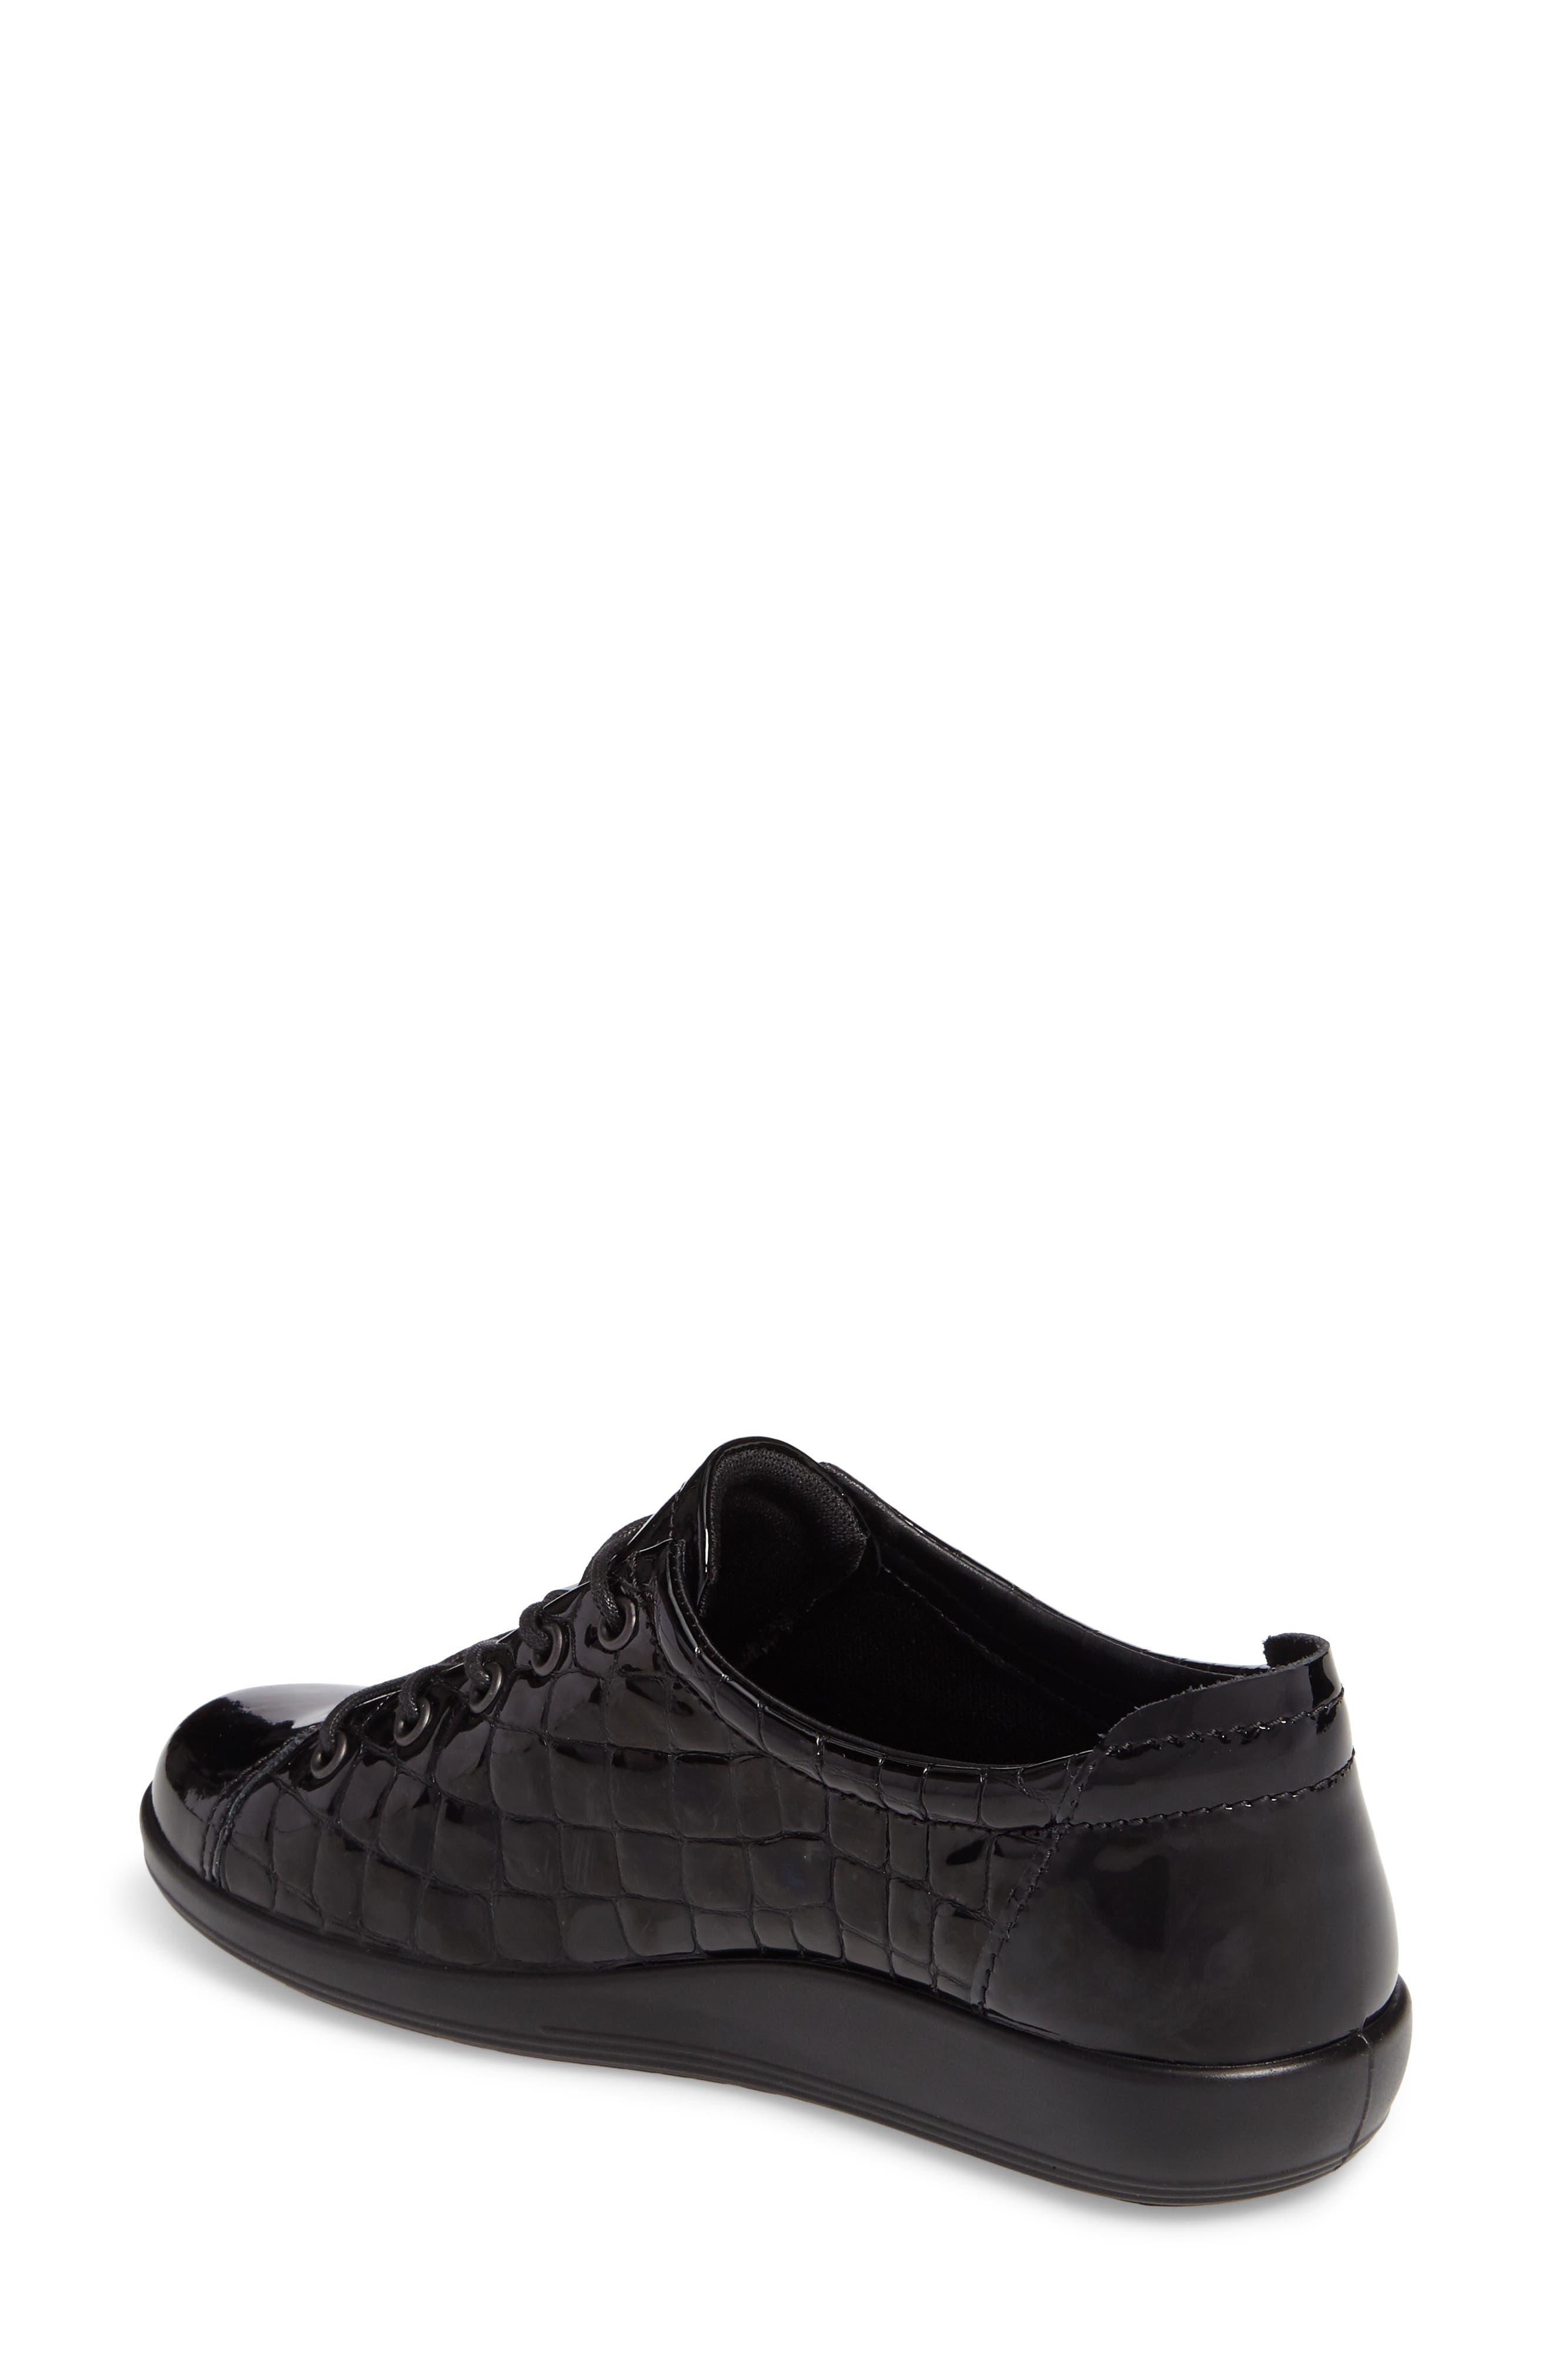 Alternate Image 2  - ECCO 'Soft 2.0' Sneaker (Women)